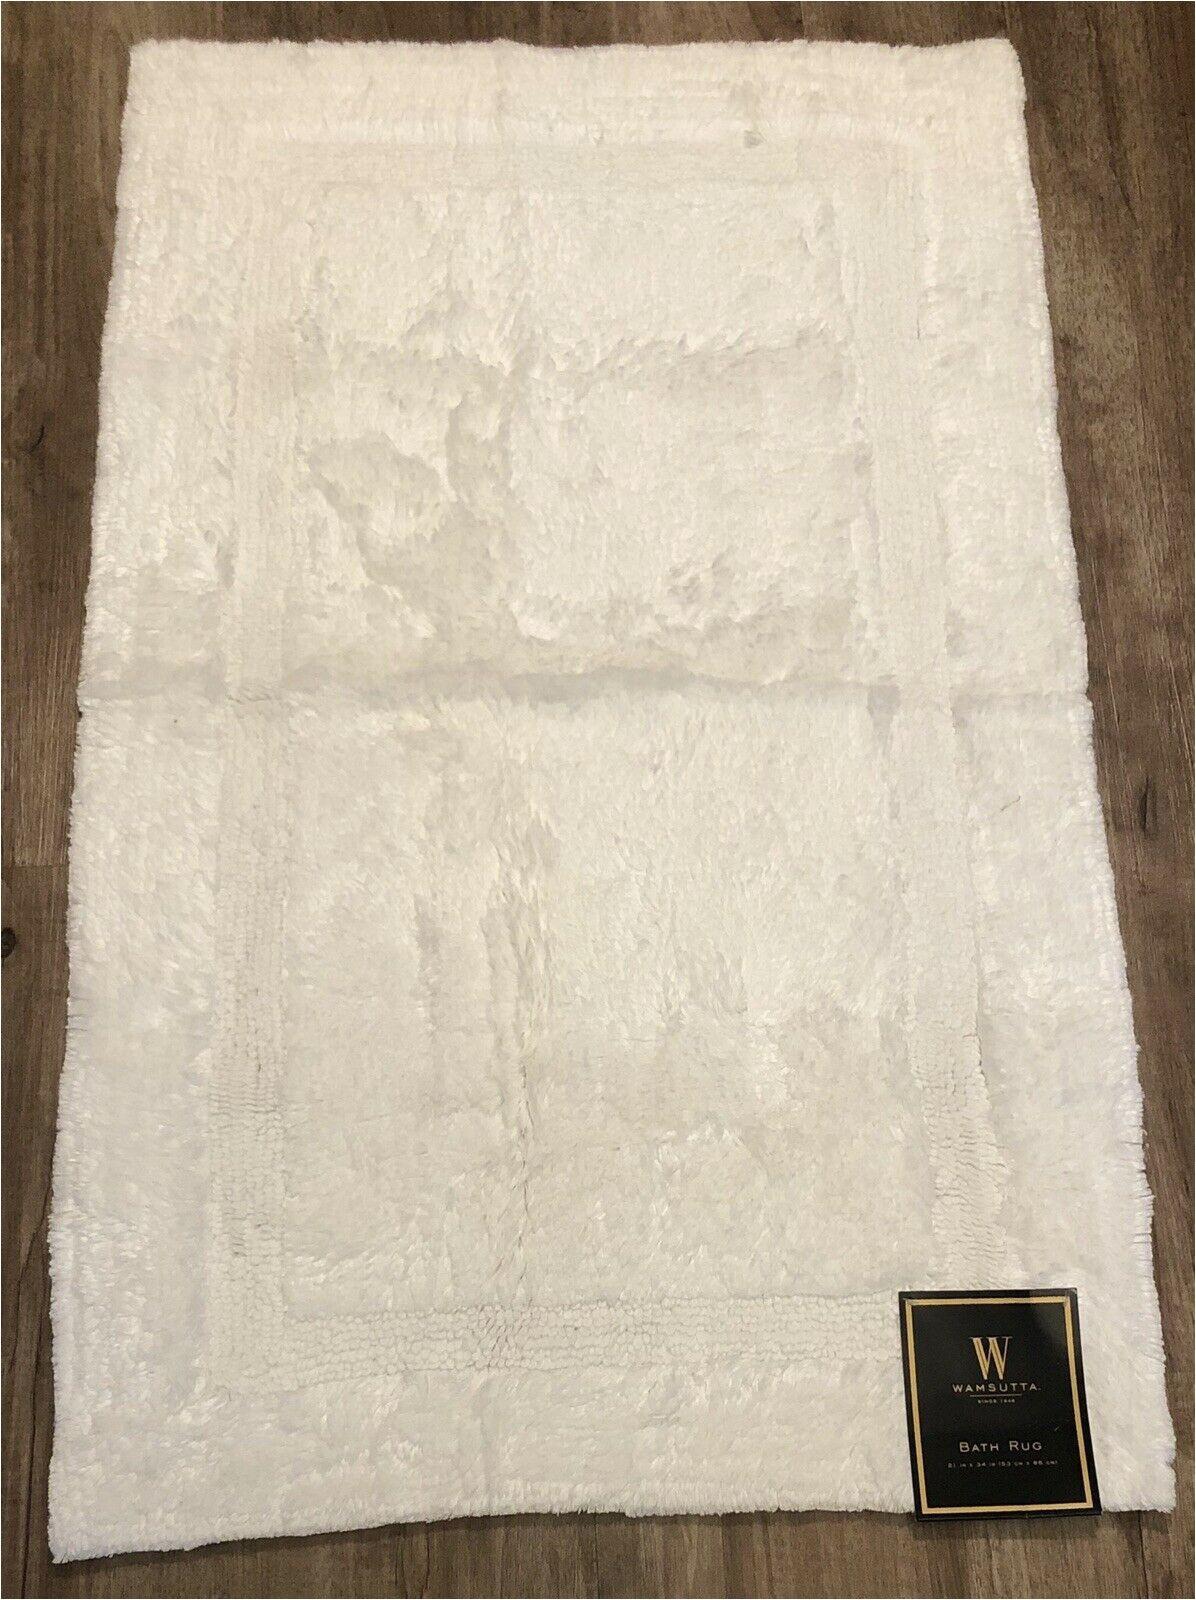 "Wamsutta Reversible Cotton Bath Rugs Wamsutta Plush Hotel Spa Bath Rug Mat 21"" X 34"" In White Bed Bath & Beyond New"